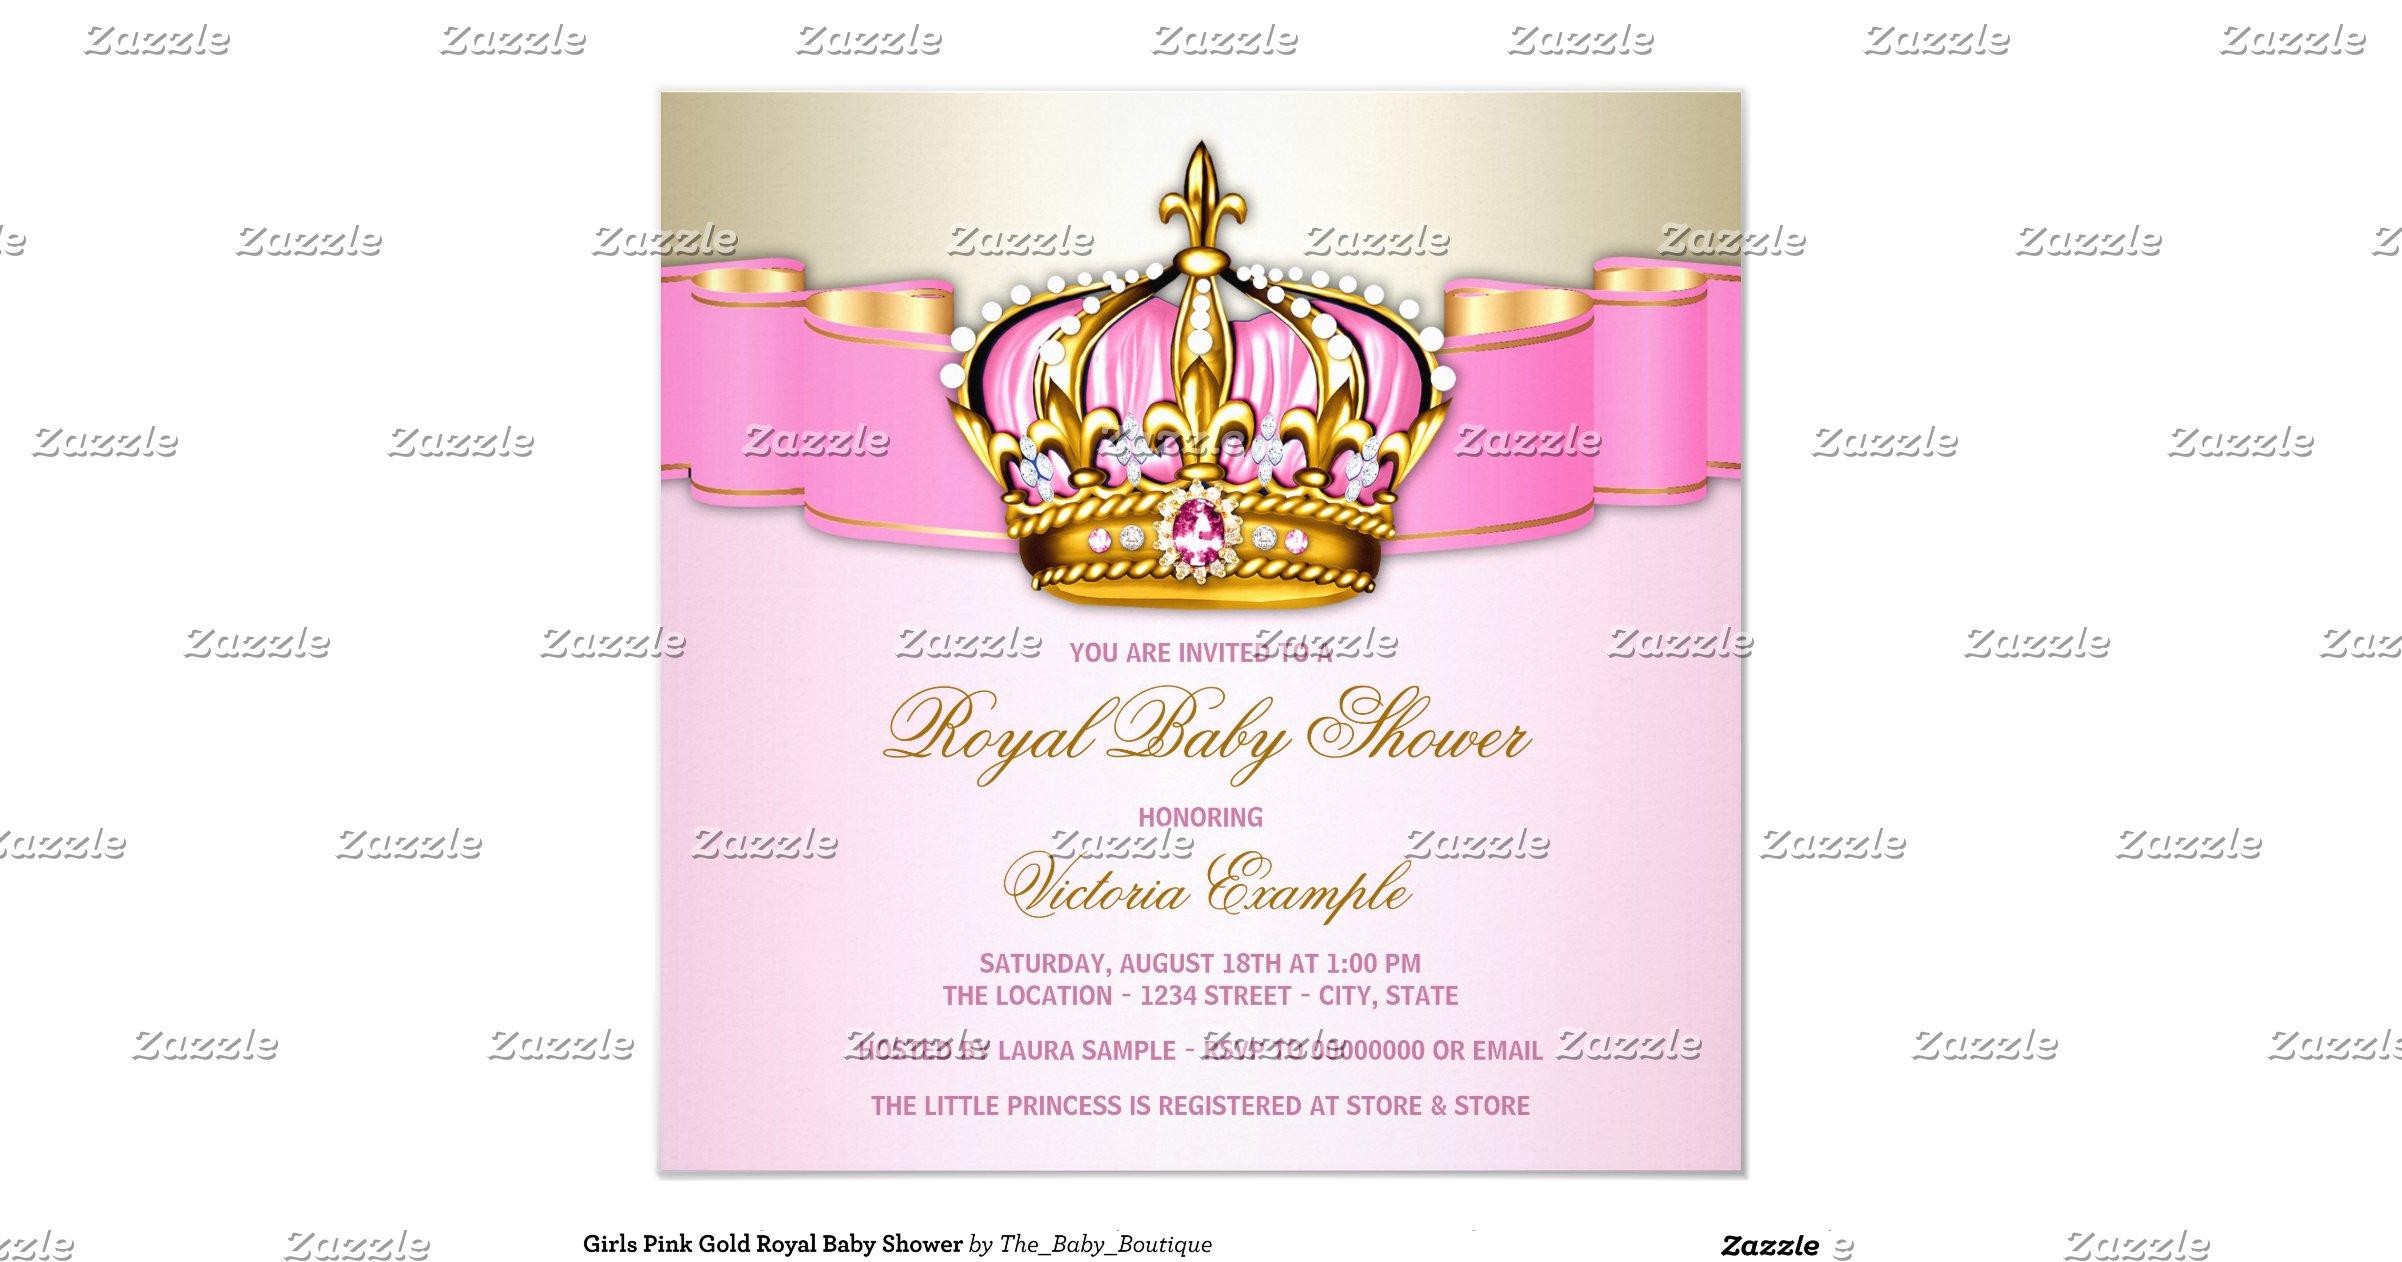 girls pink gold royal baby shower invitation